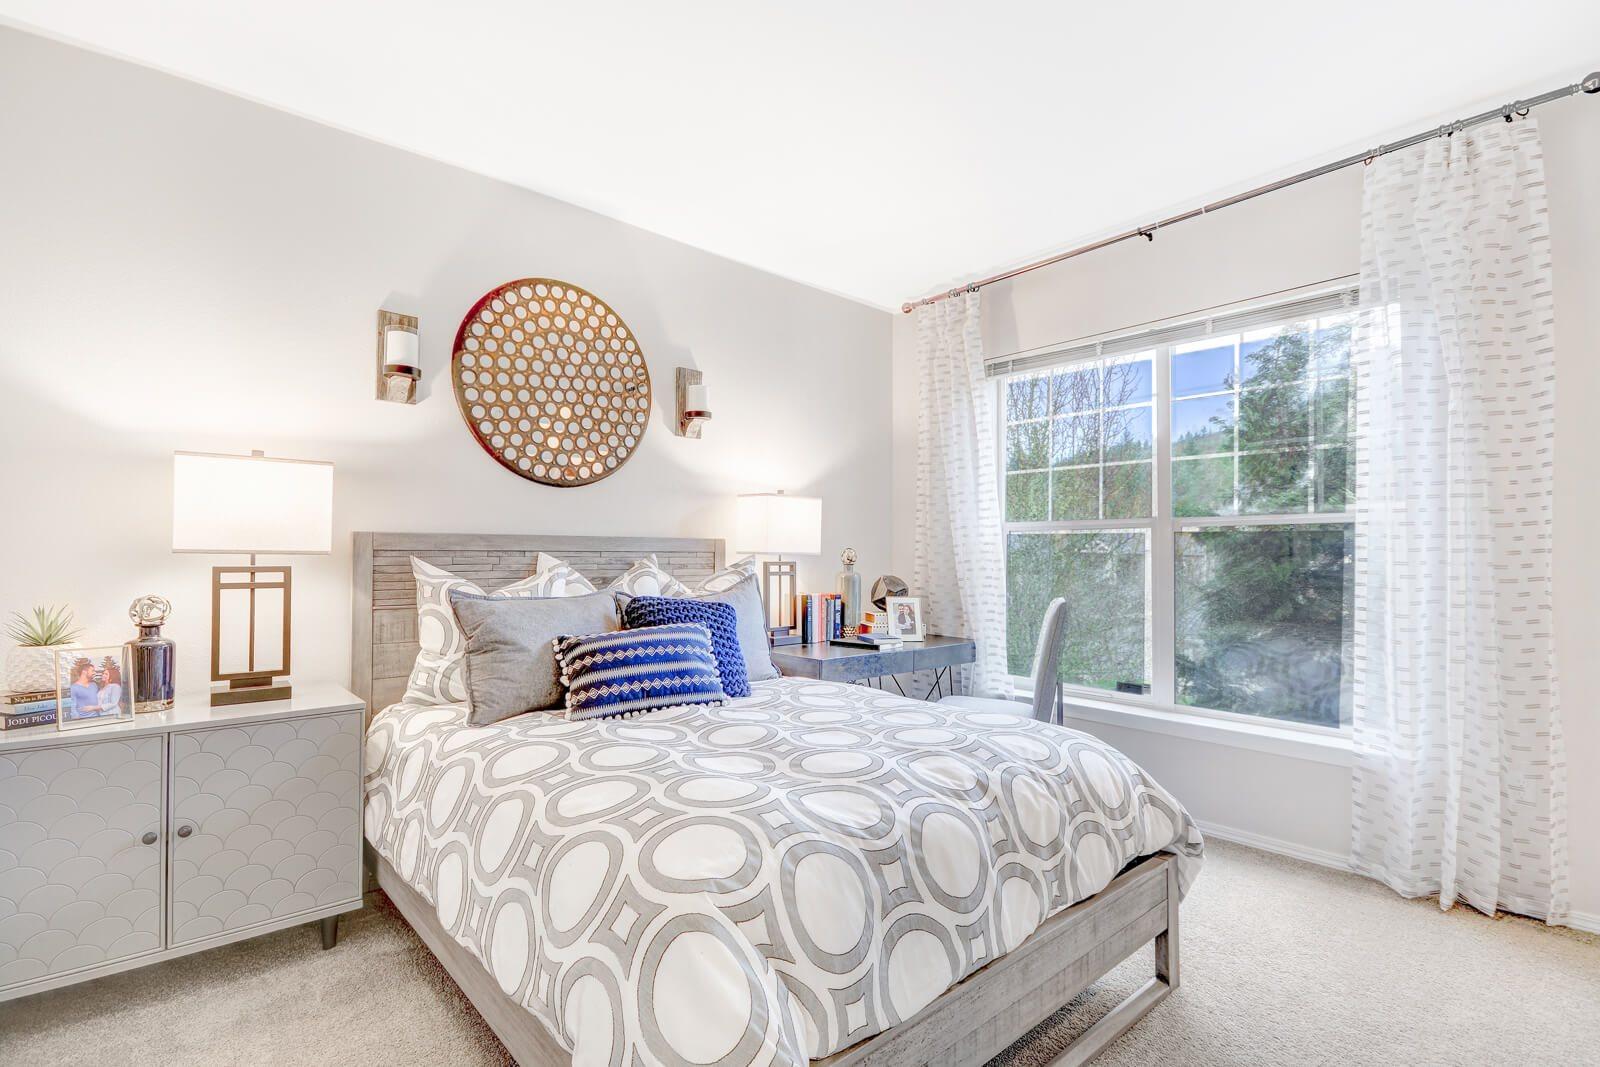 Sun Soaked Living Spaces at The Estates at Cougar Mountain, Washington, 98027